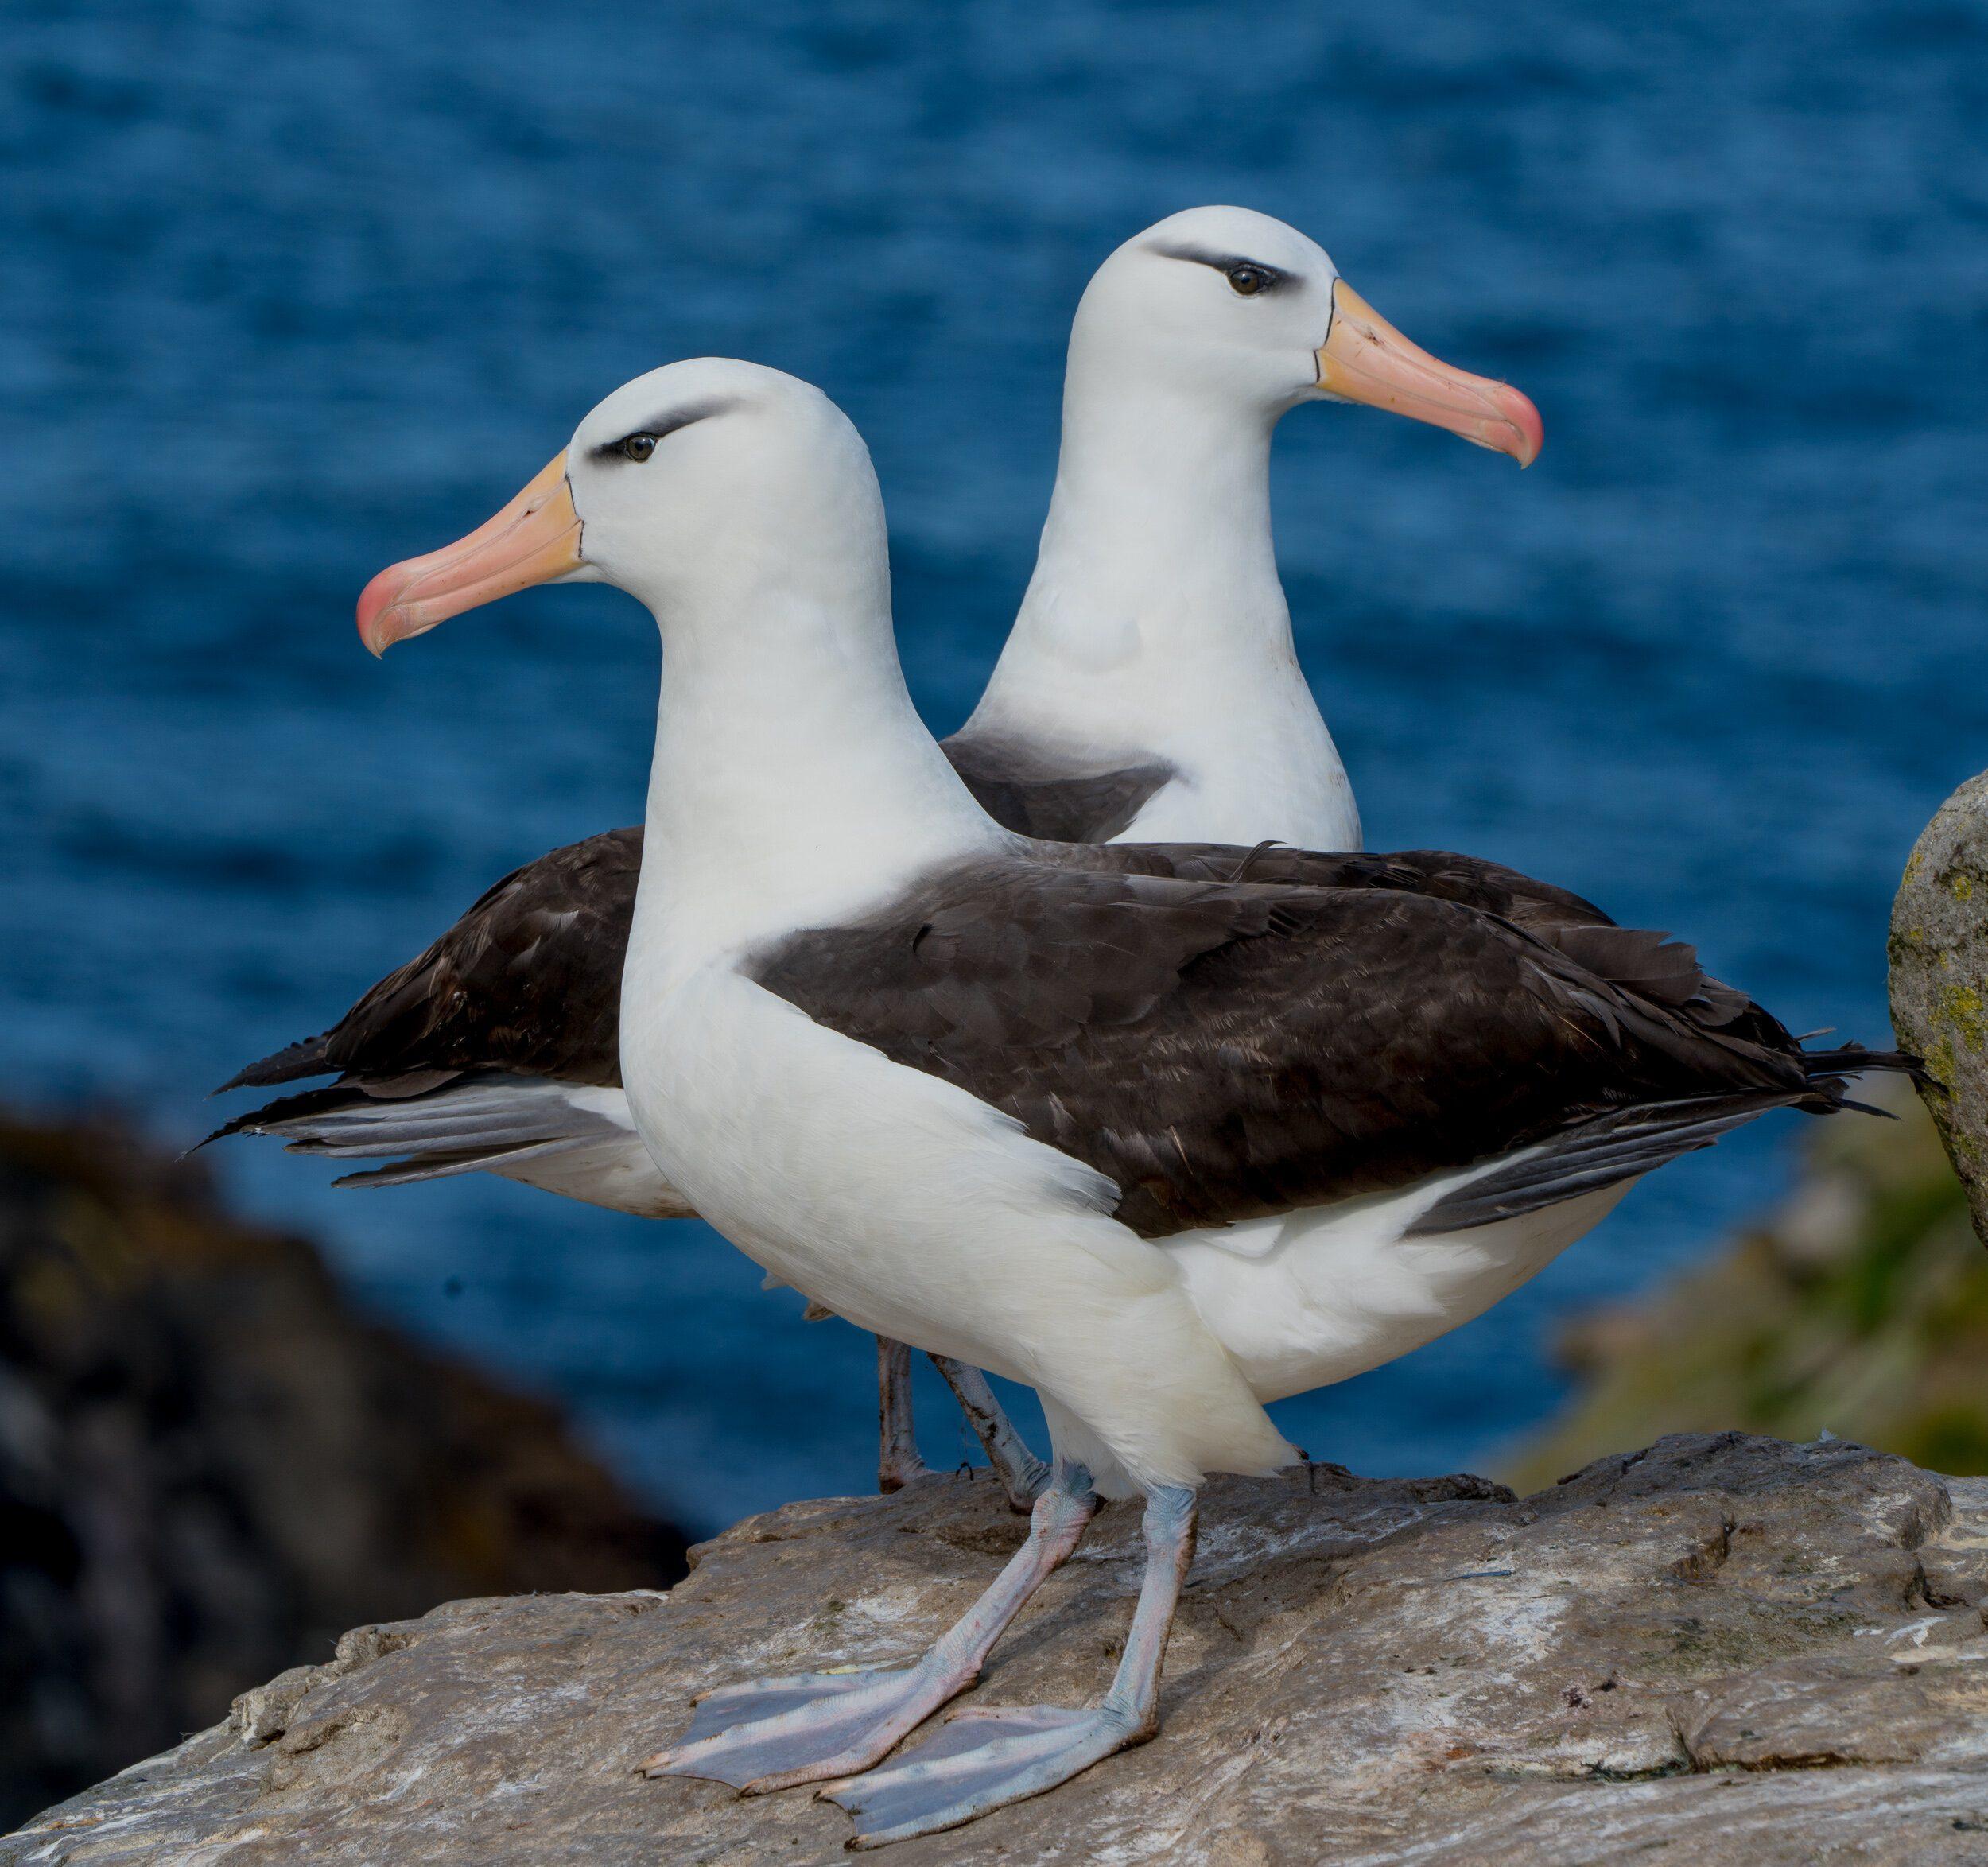 The Black-Browed Albatross